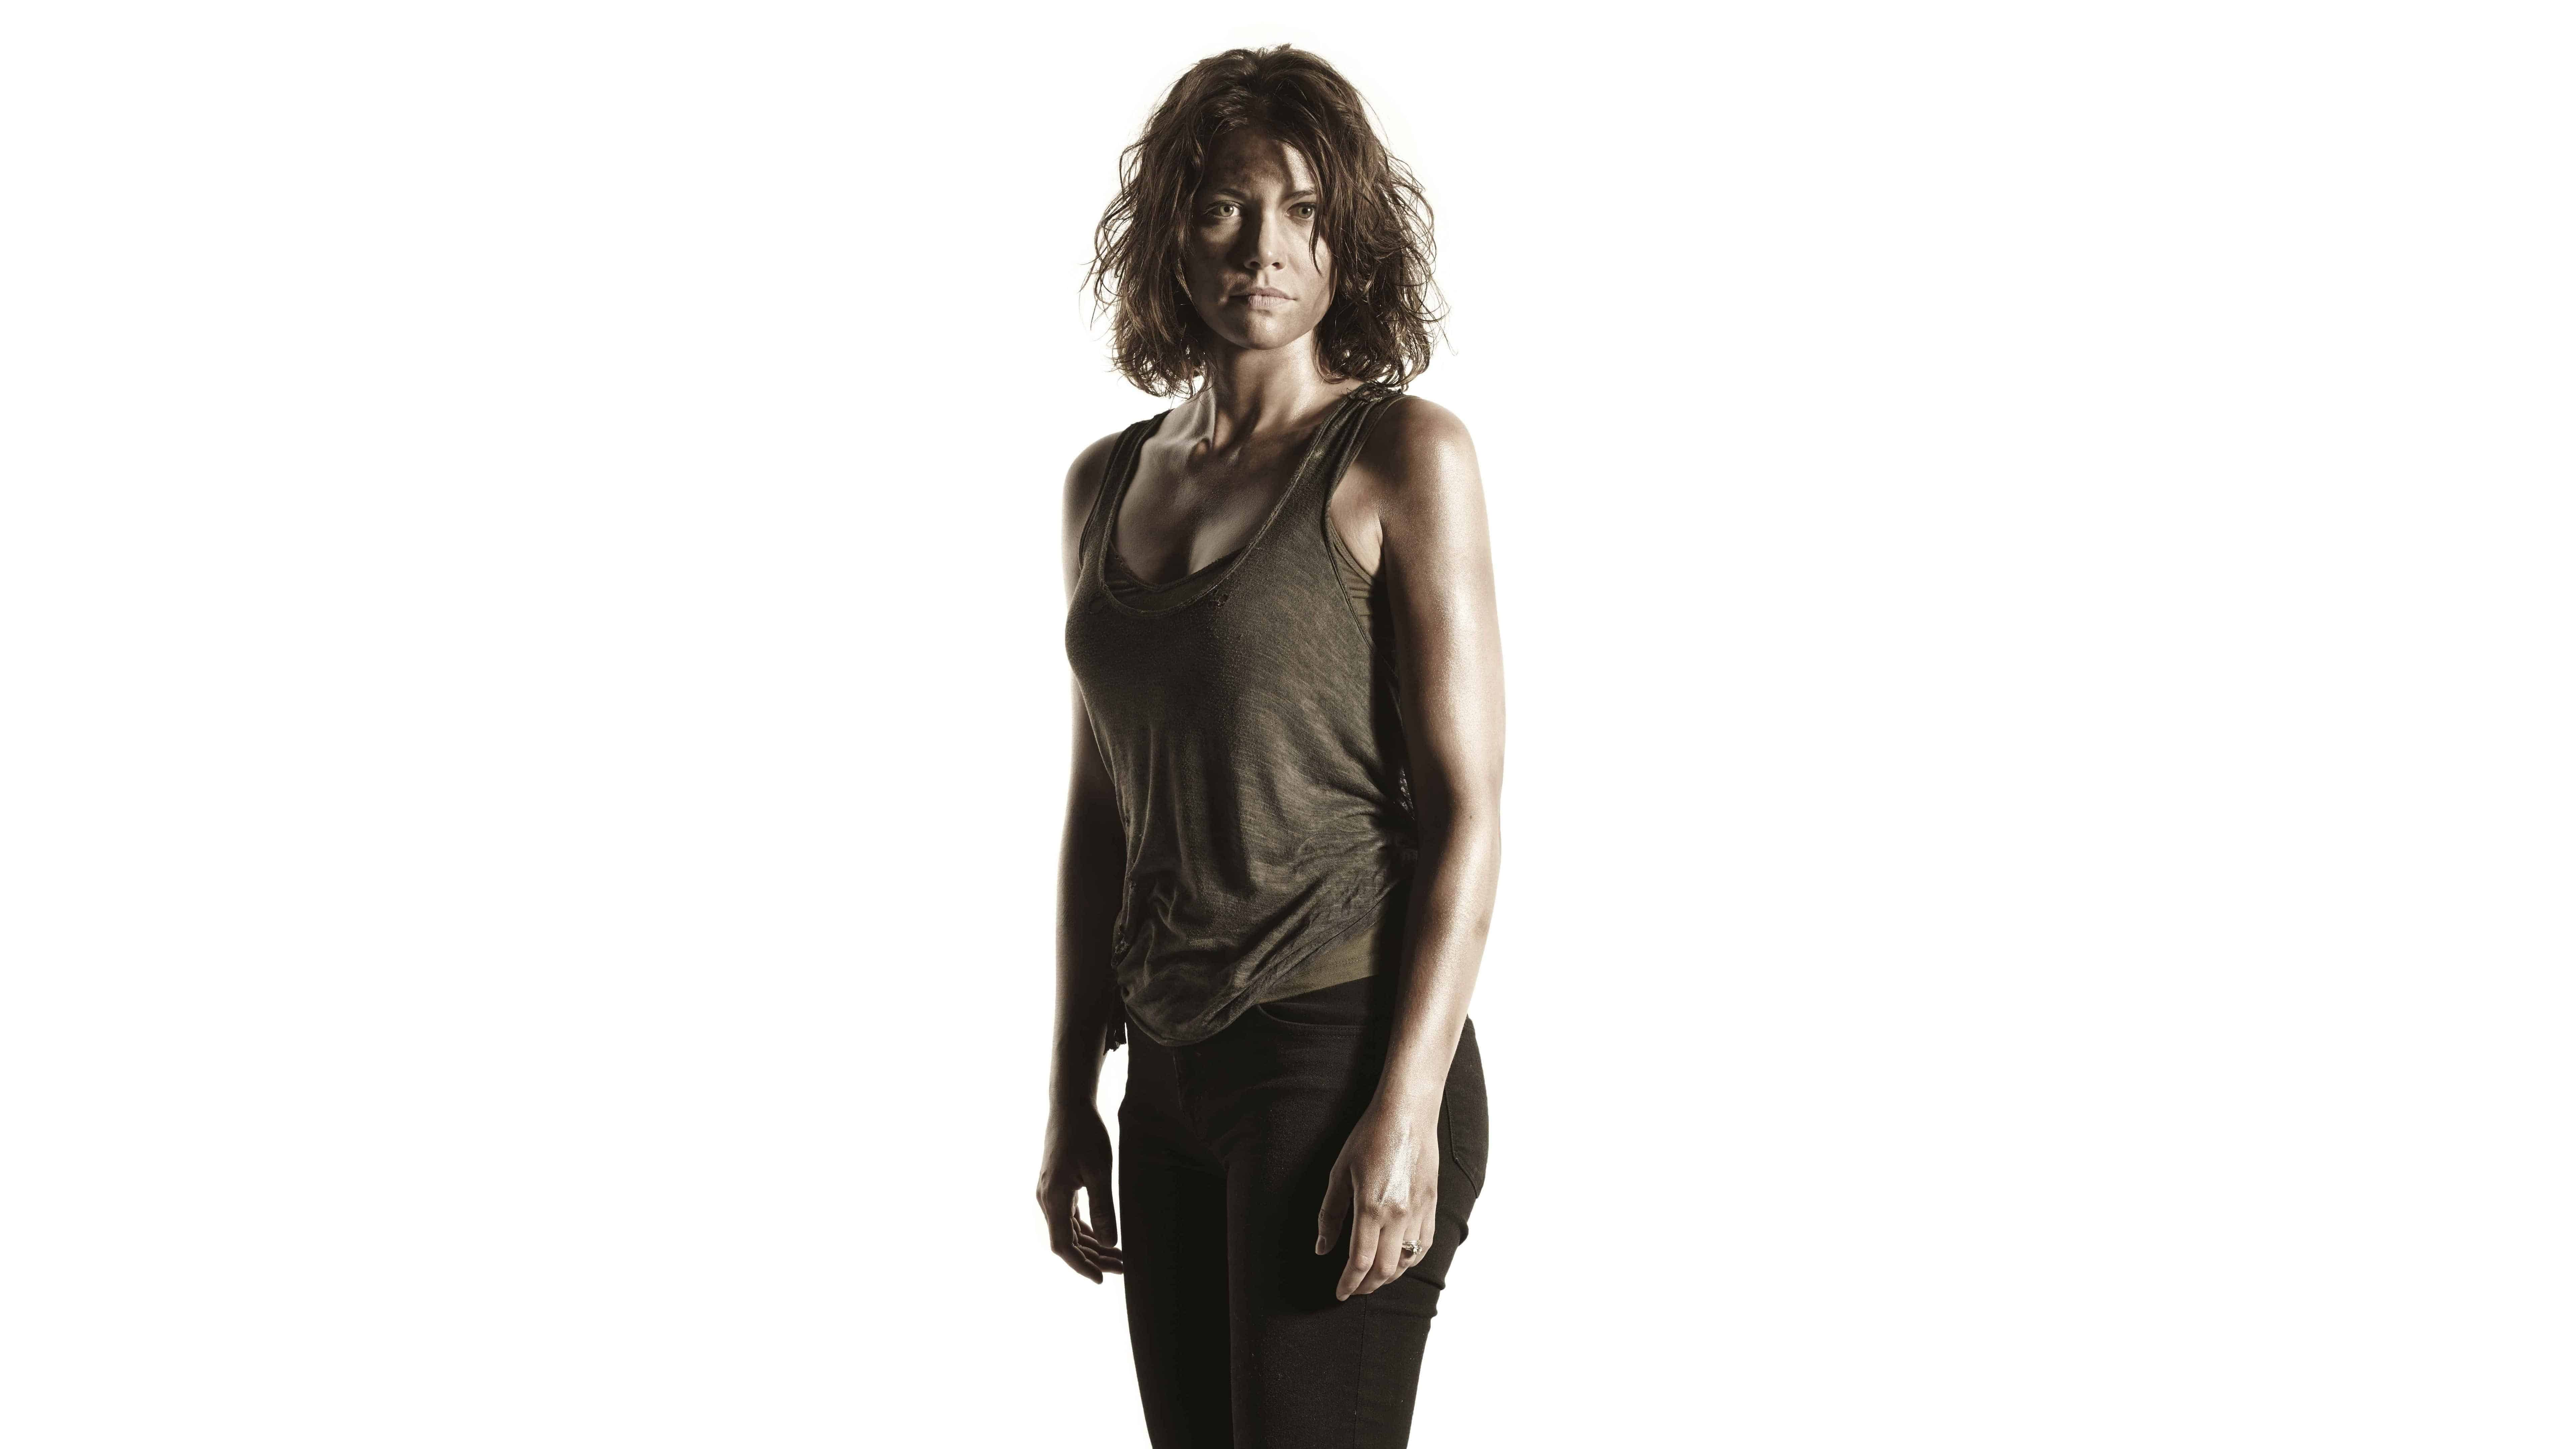 Related Images - Lauren Cohan Walking Dead Season 4 , HD Wallpaper & Backgrounds